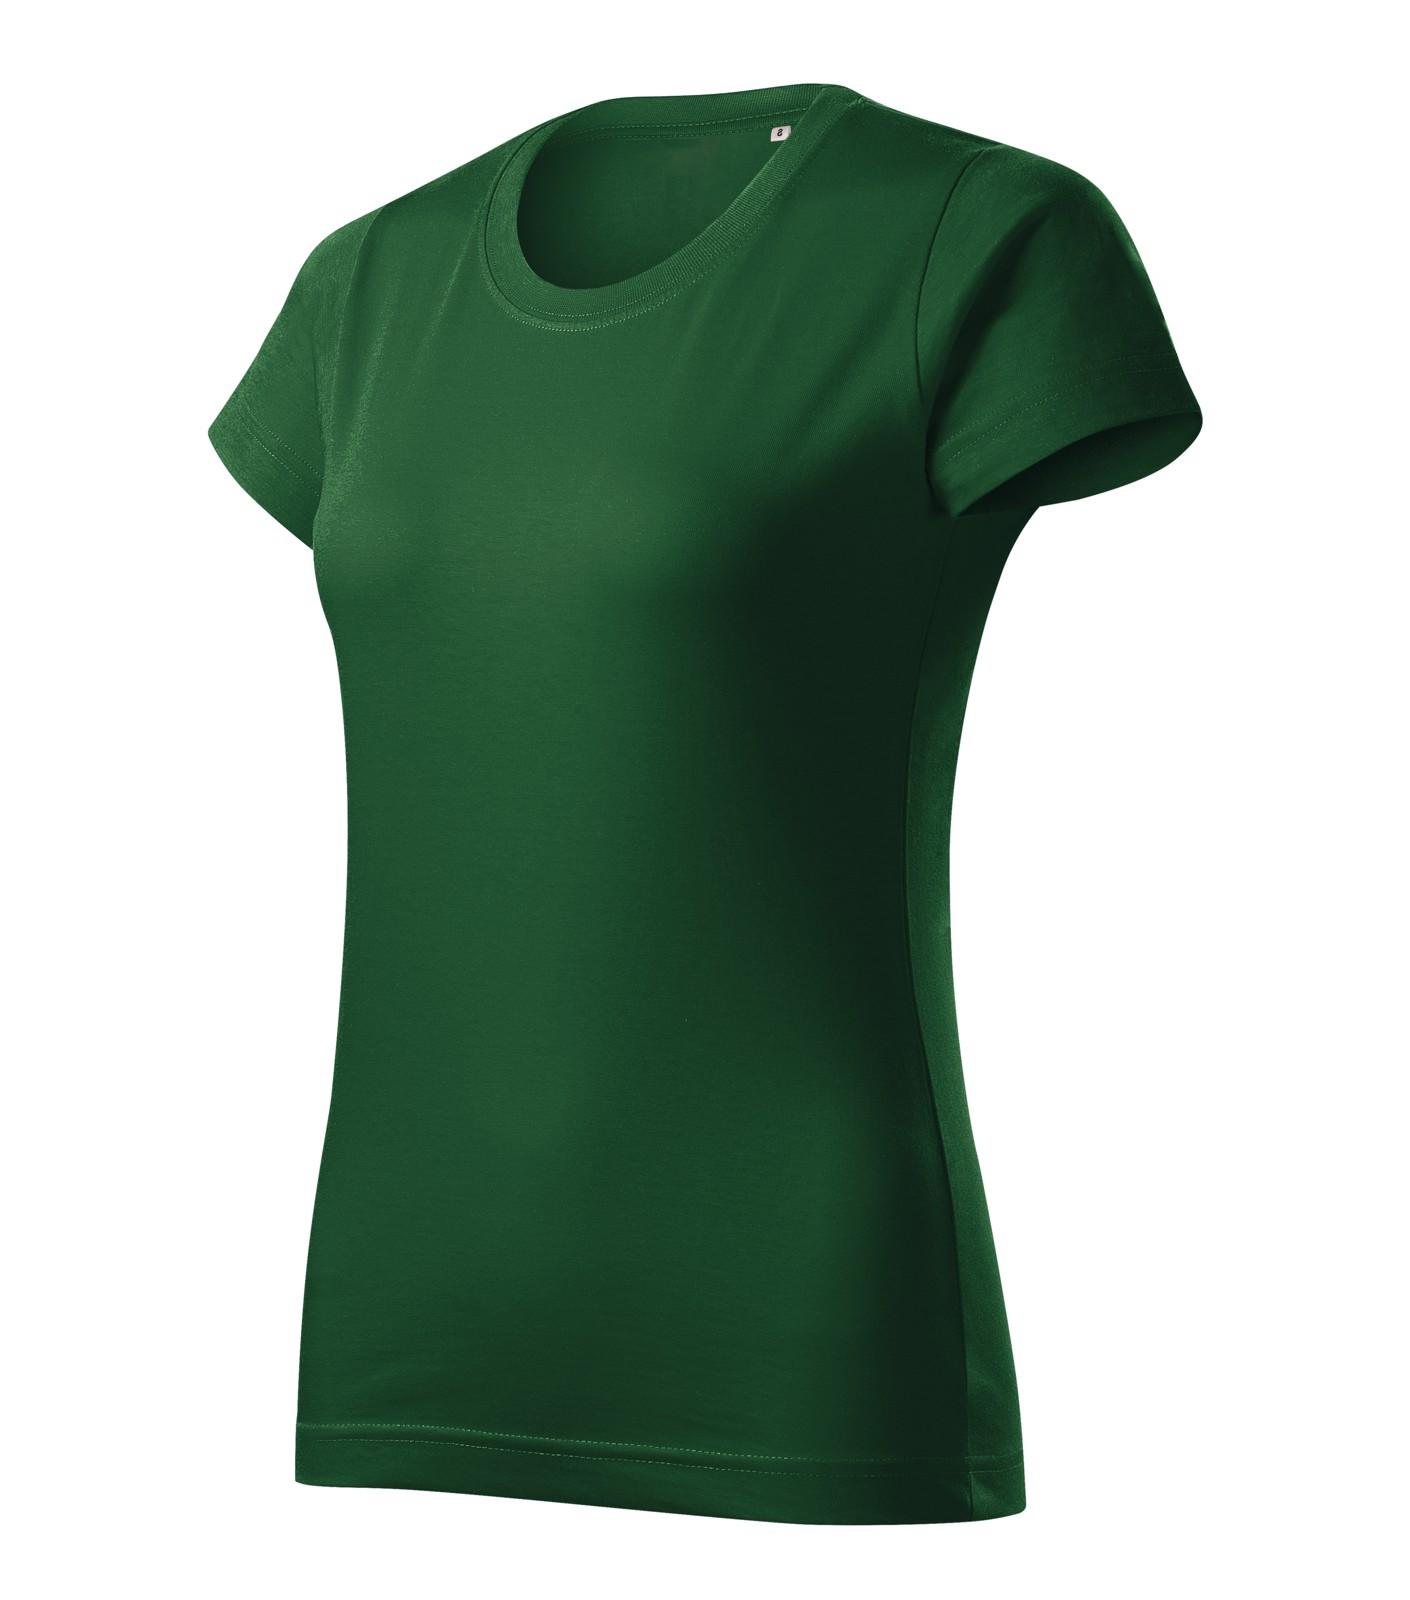 T-shirt women's Malfini Basic Free - Bottle Green / L